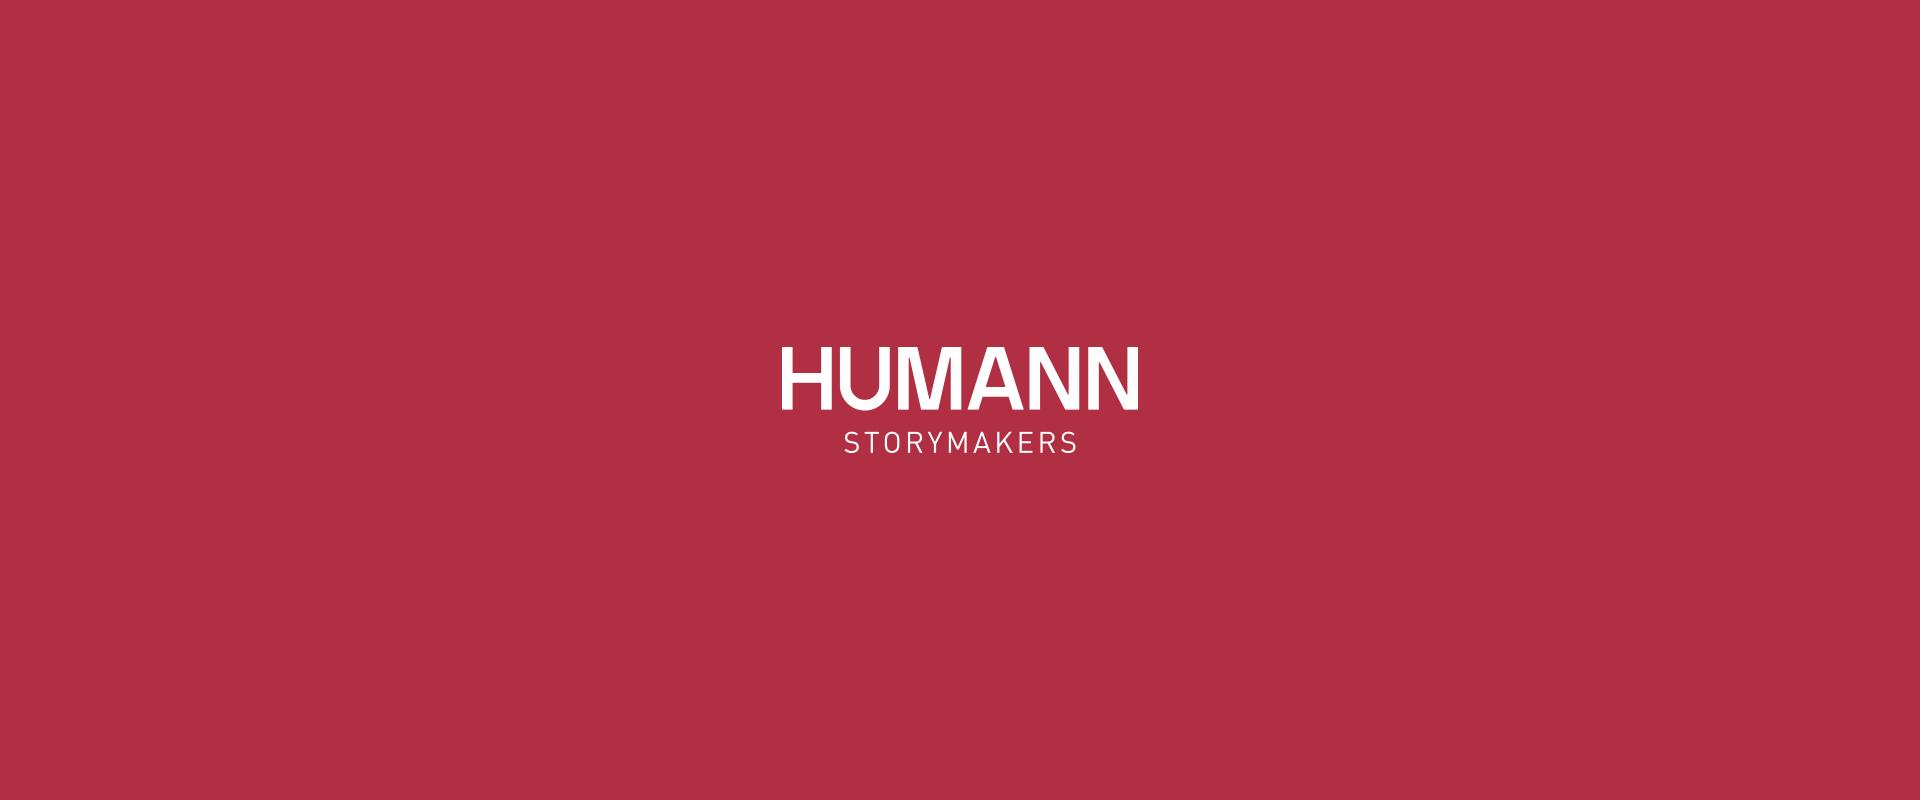 LOCO HUMANN Primer corte.001.jpeg